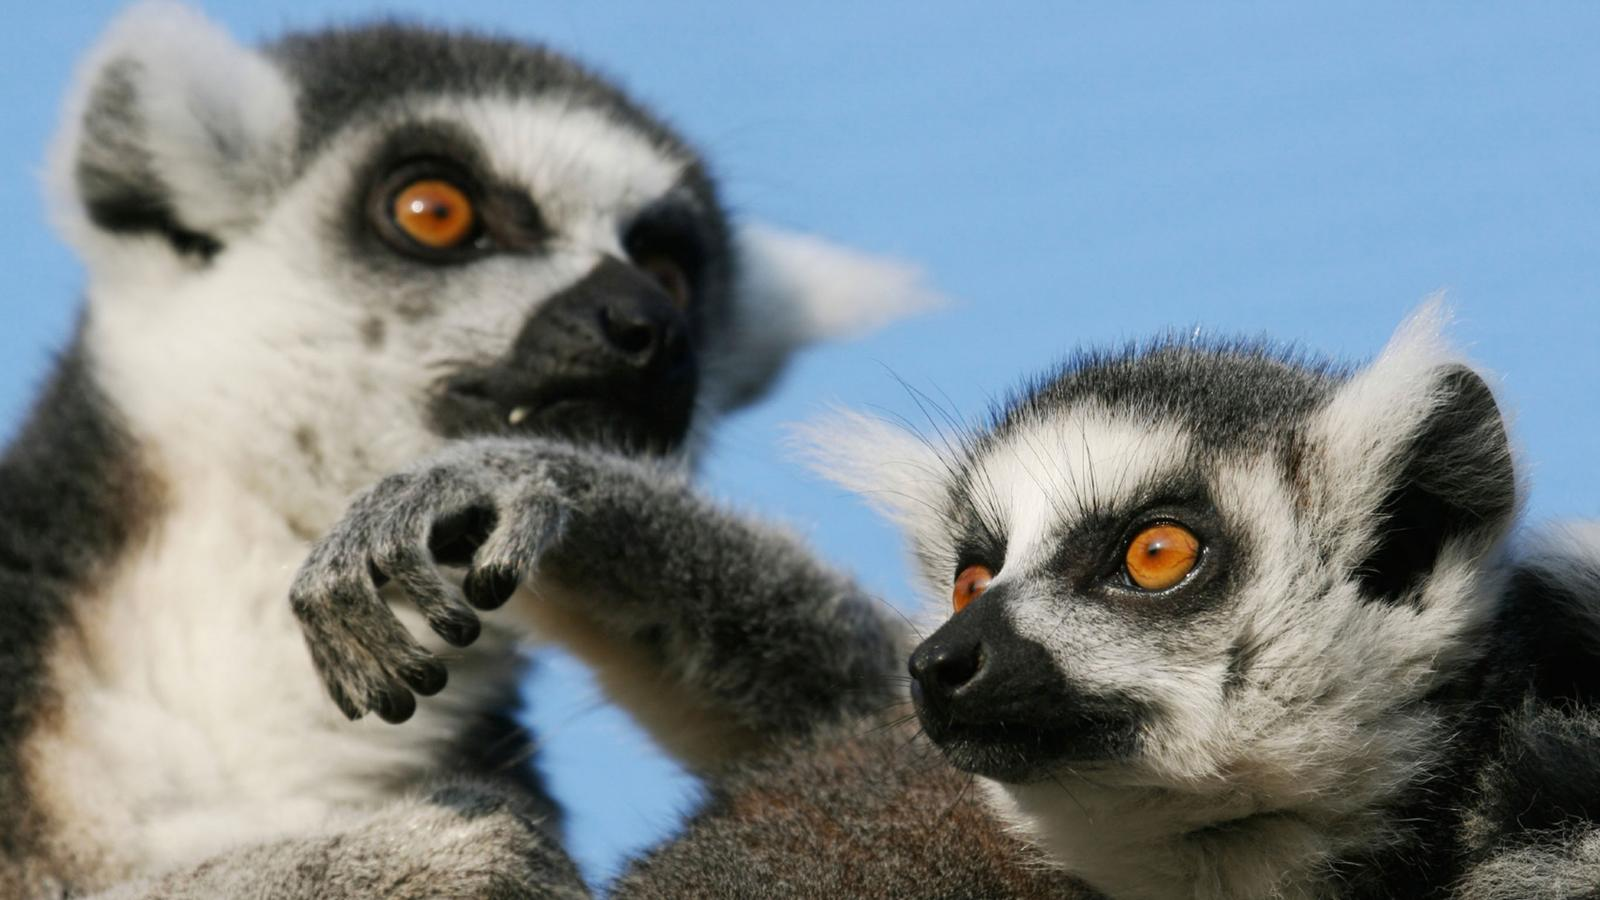 traveljunkies Madagaskar Abenteuerreise Lemuren Rundreise Gruppenreise Erlebnisreise Afrika